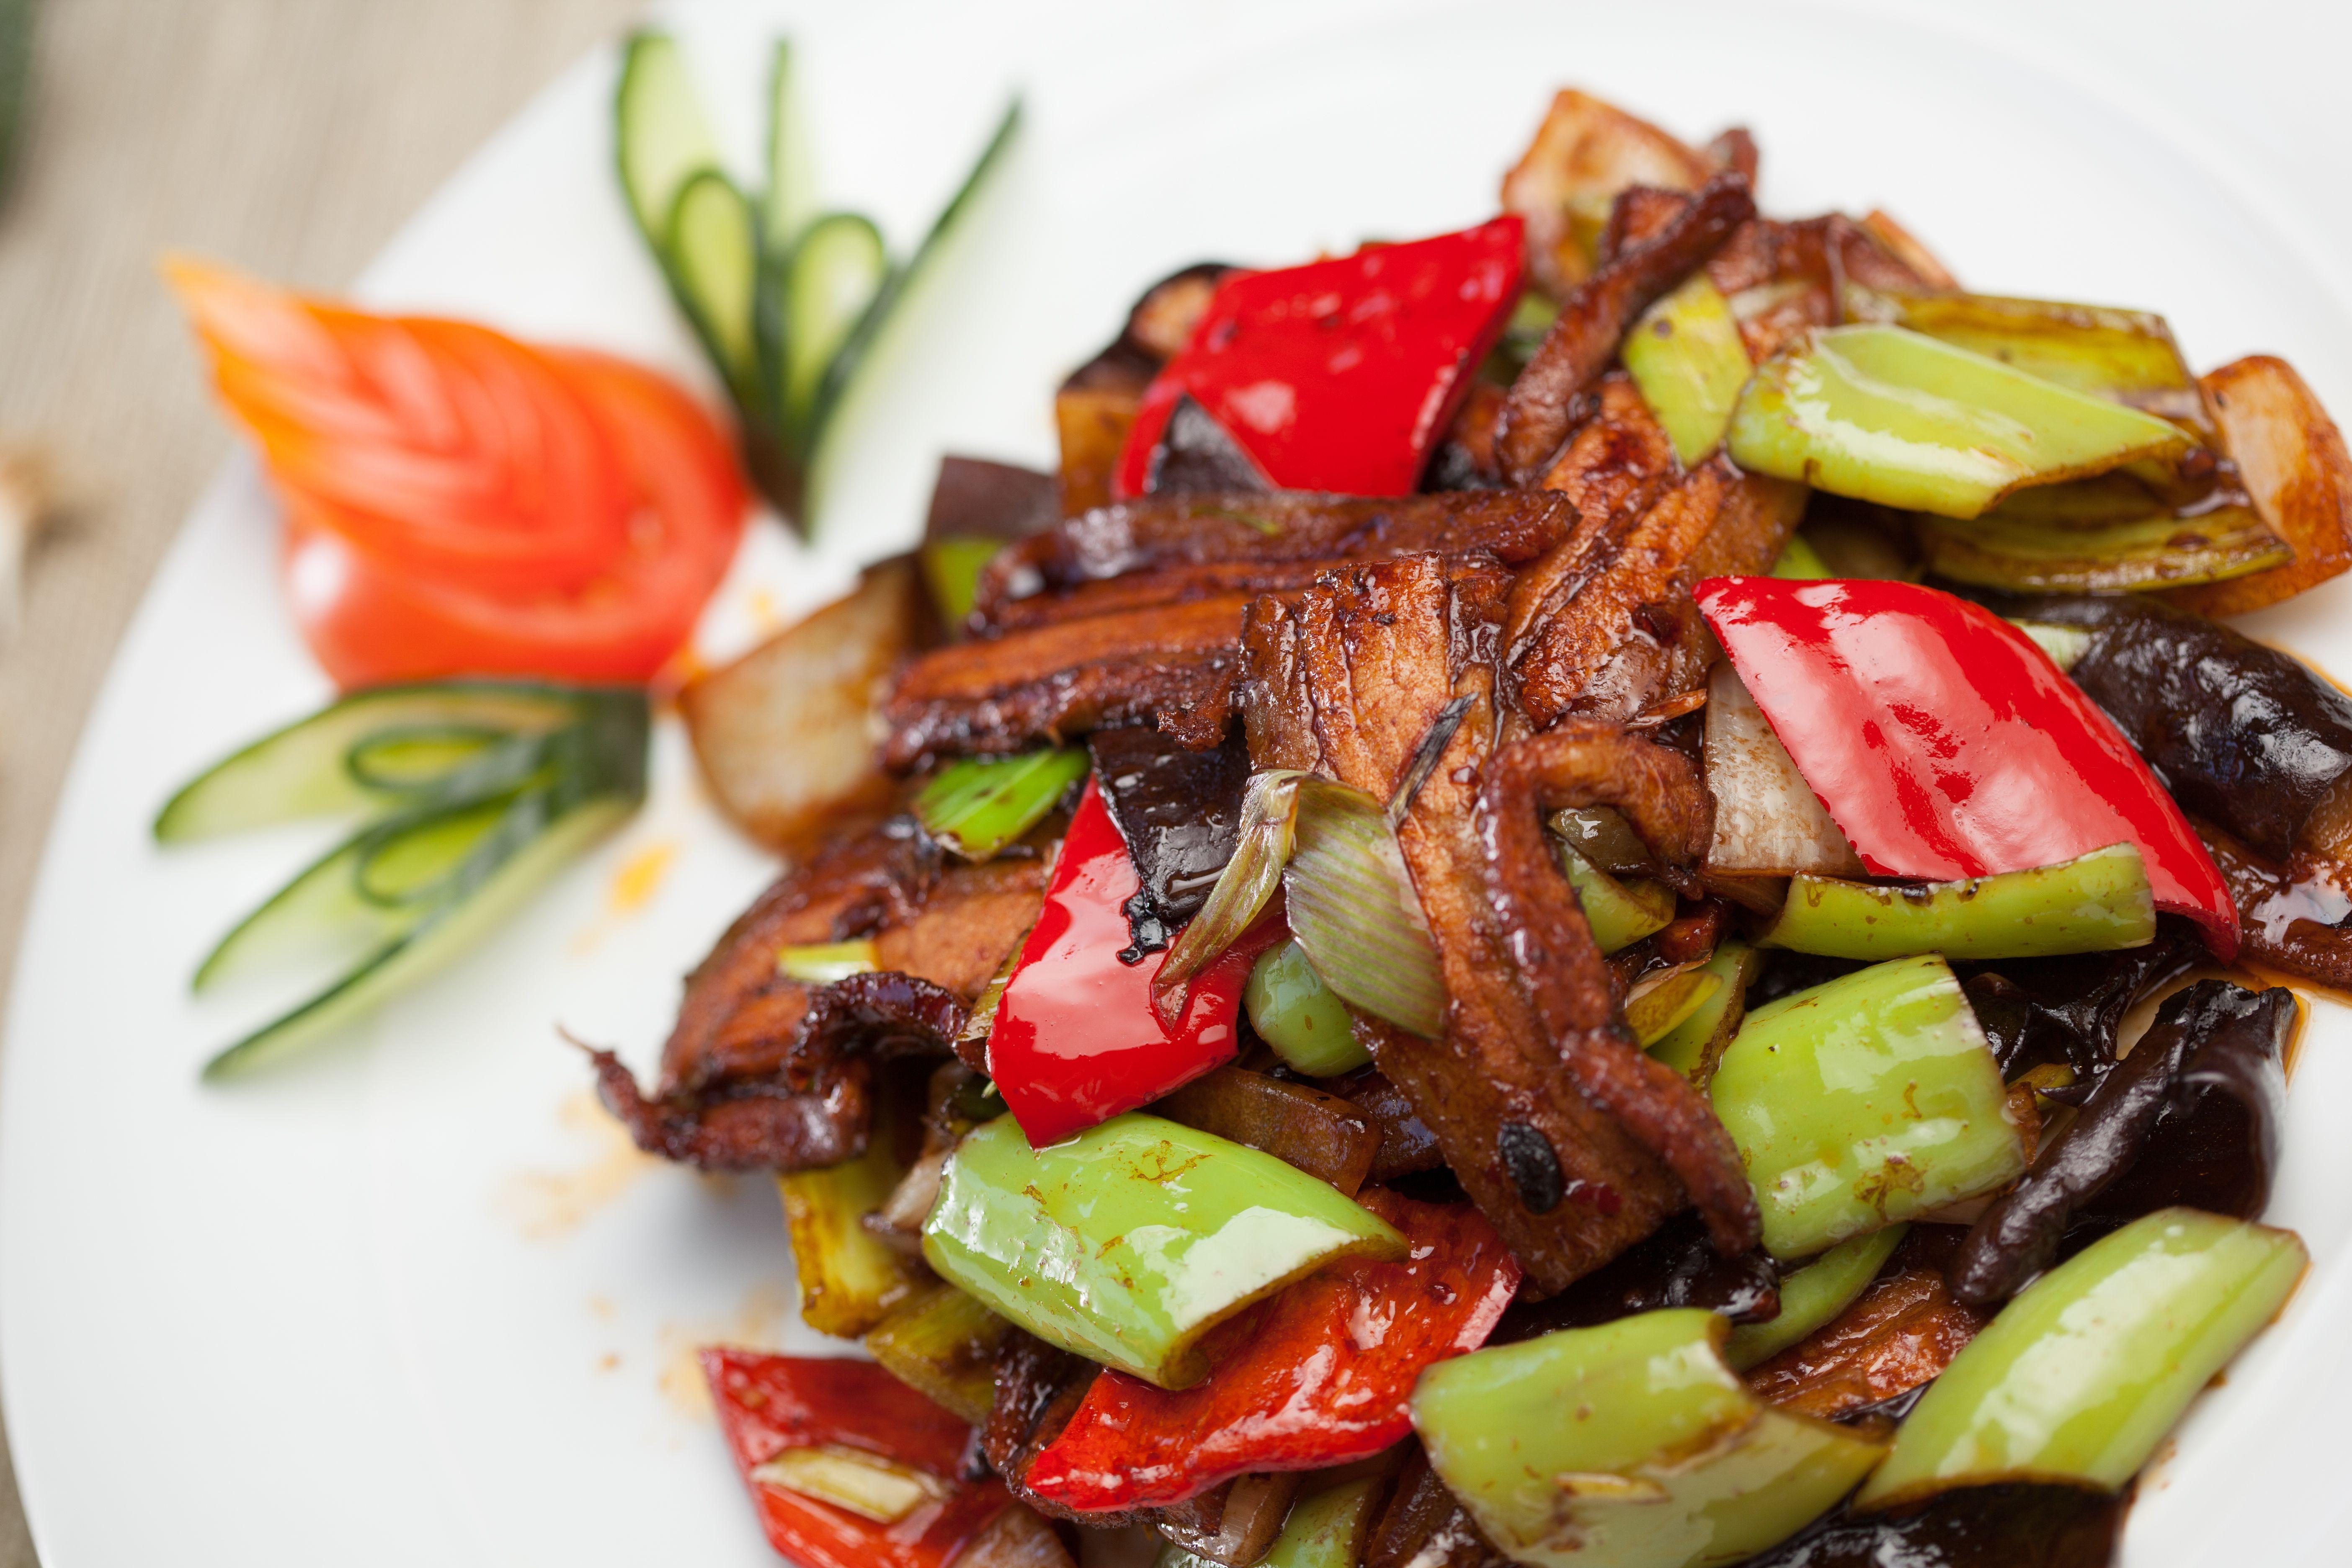 szechuan twice cooked pork